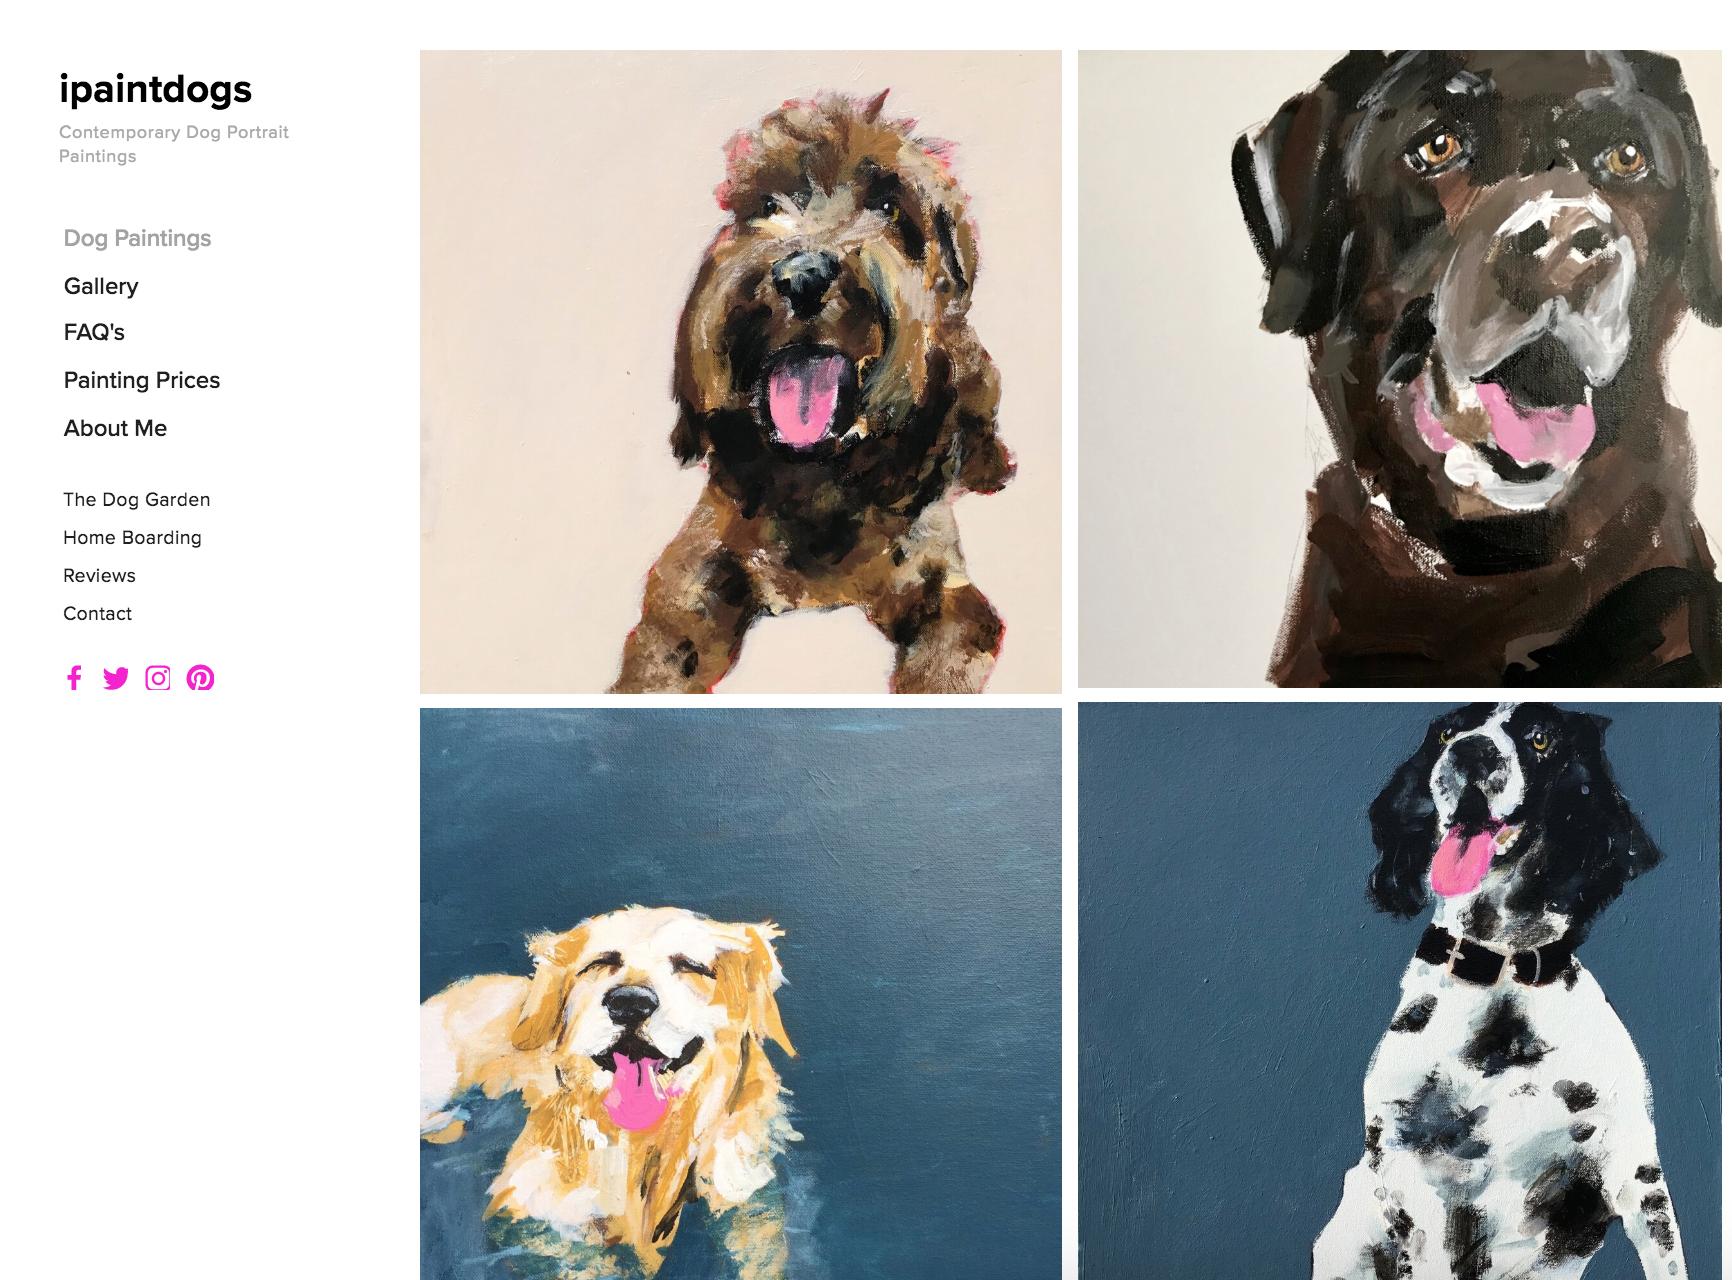 ipaintdogs.com is Samantha Barnes Artist